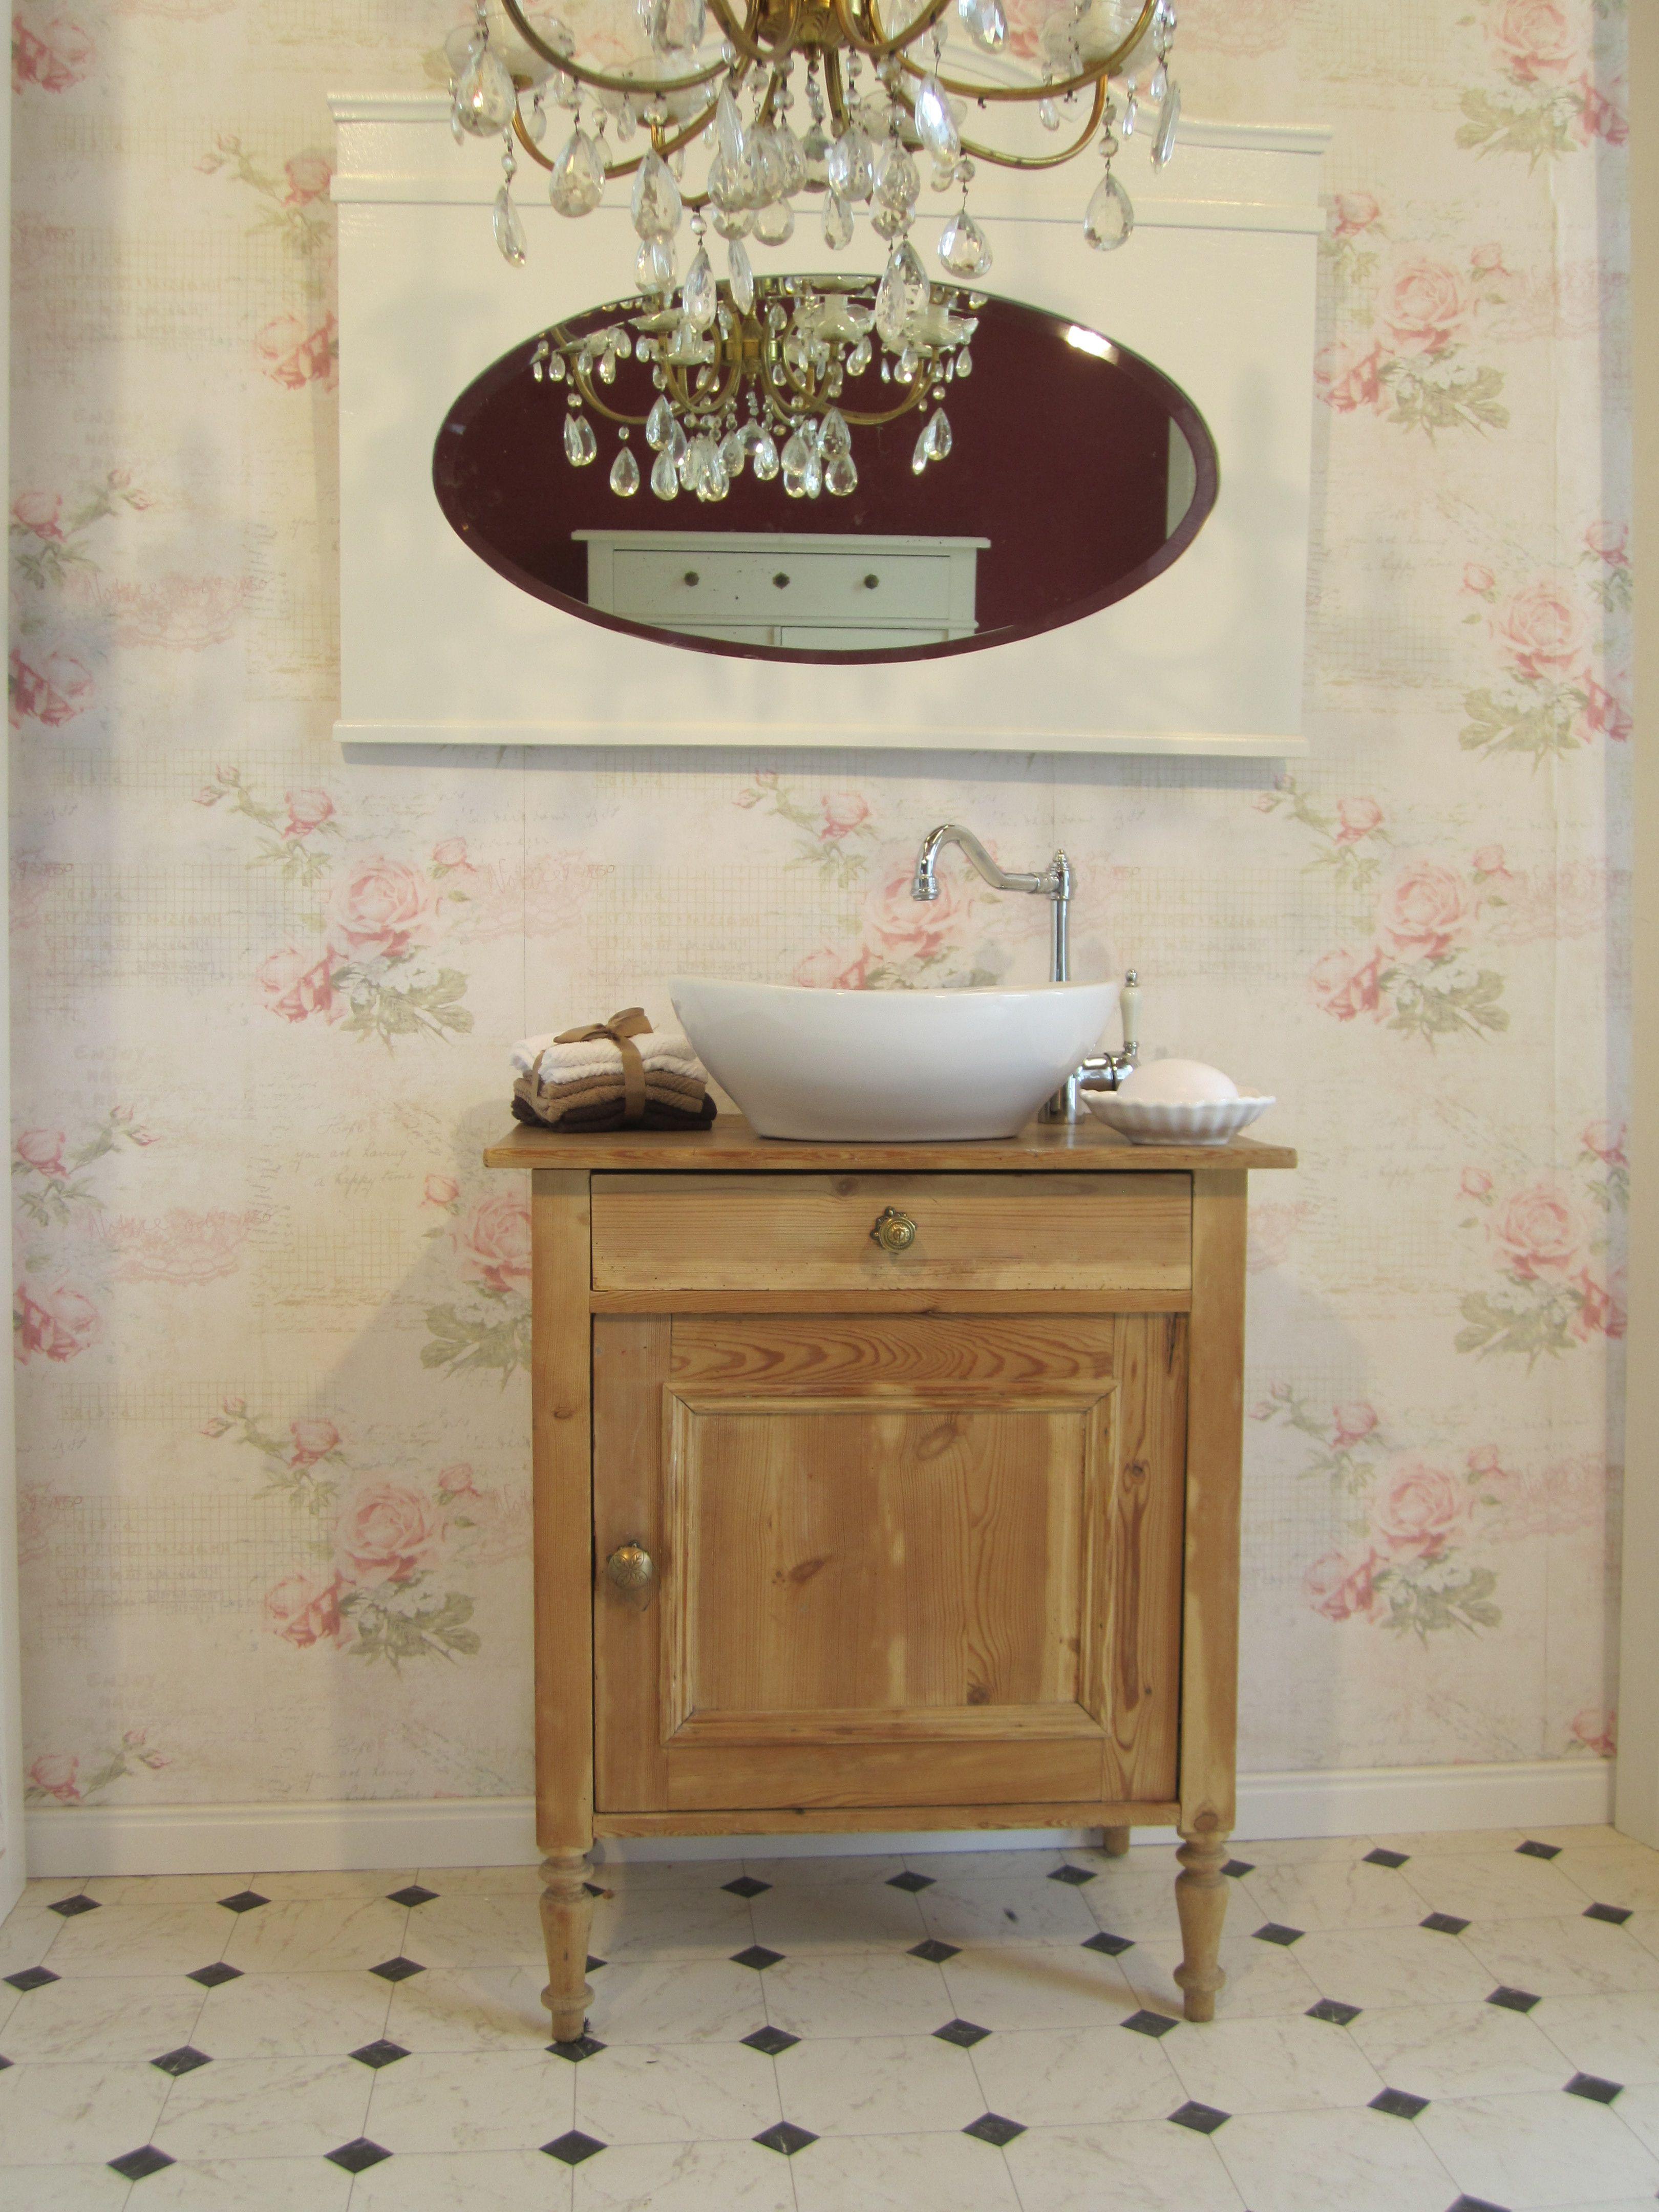 Badezimmer Armaturen Landhausstil Badezimmer Armaturen Landhaus